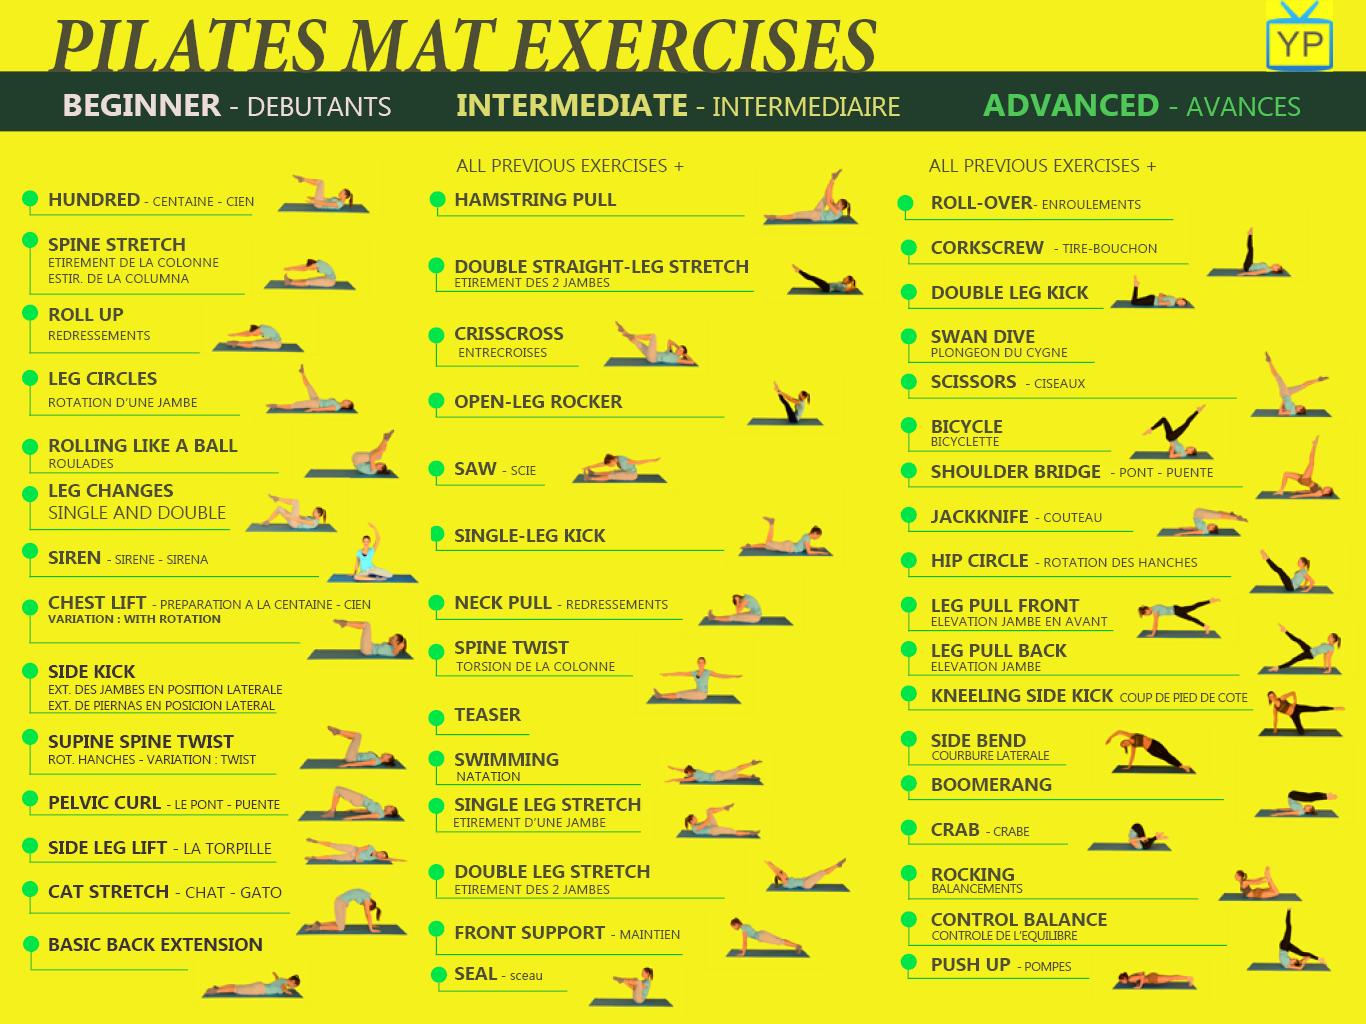 Pilates Exercises Chart Exercises Classes Charts